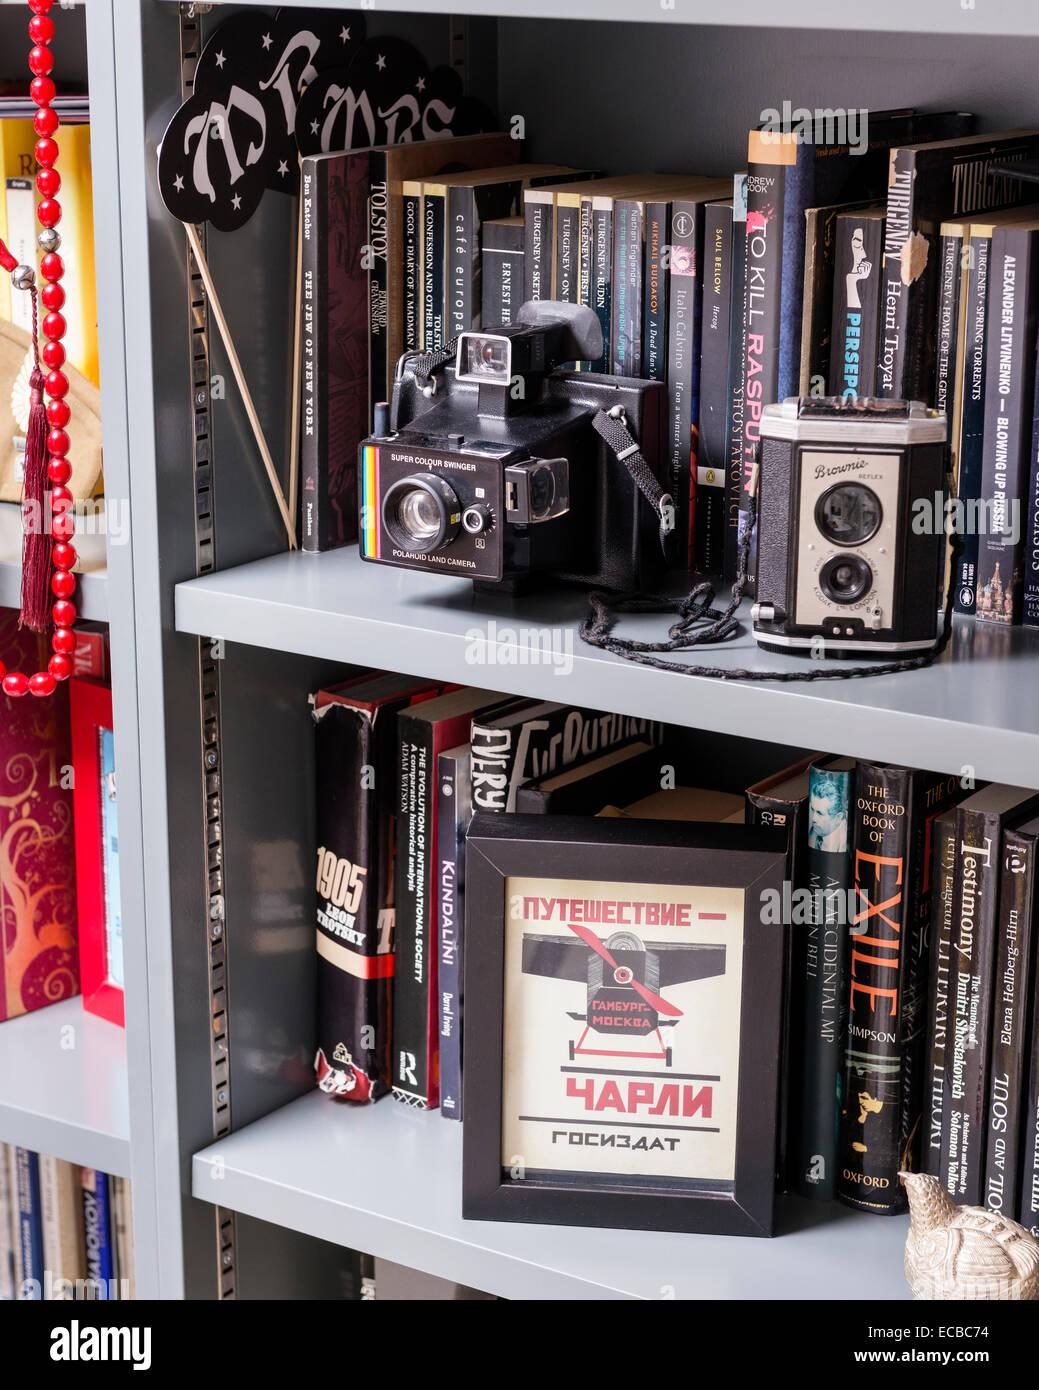 Vintage cameras on bookshelf - Stock Image